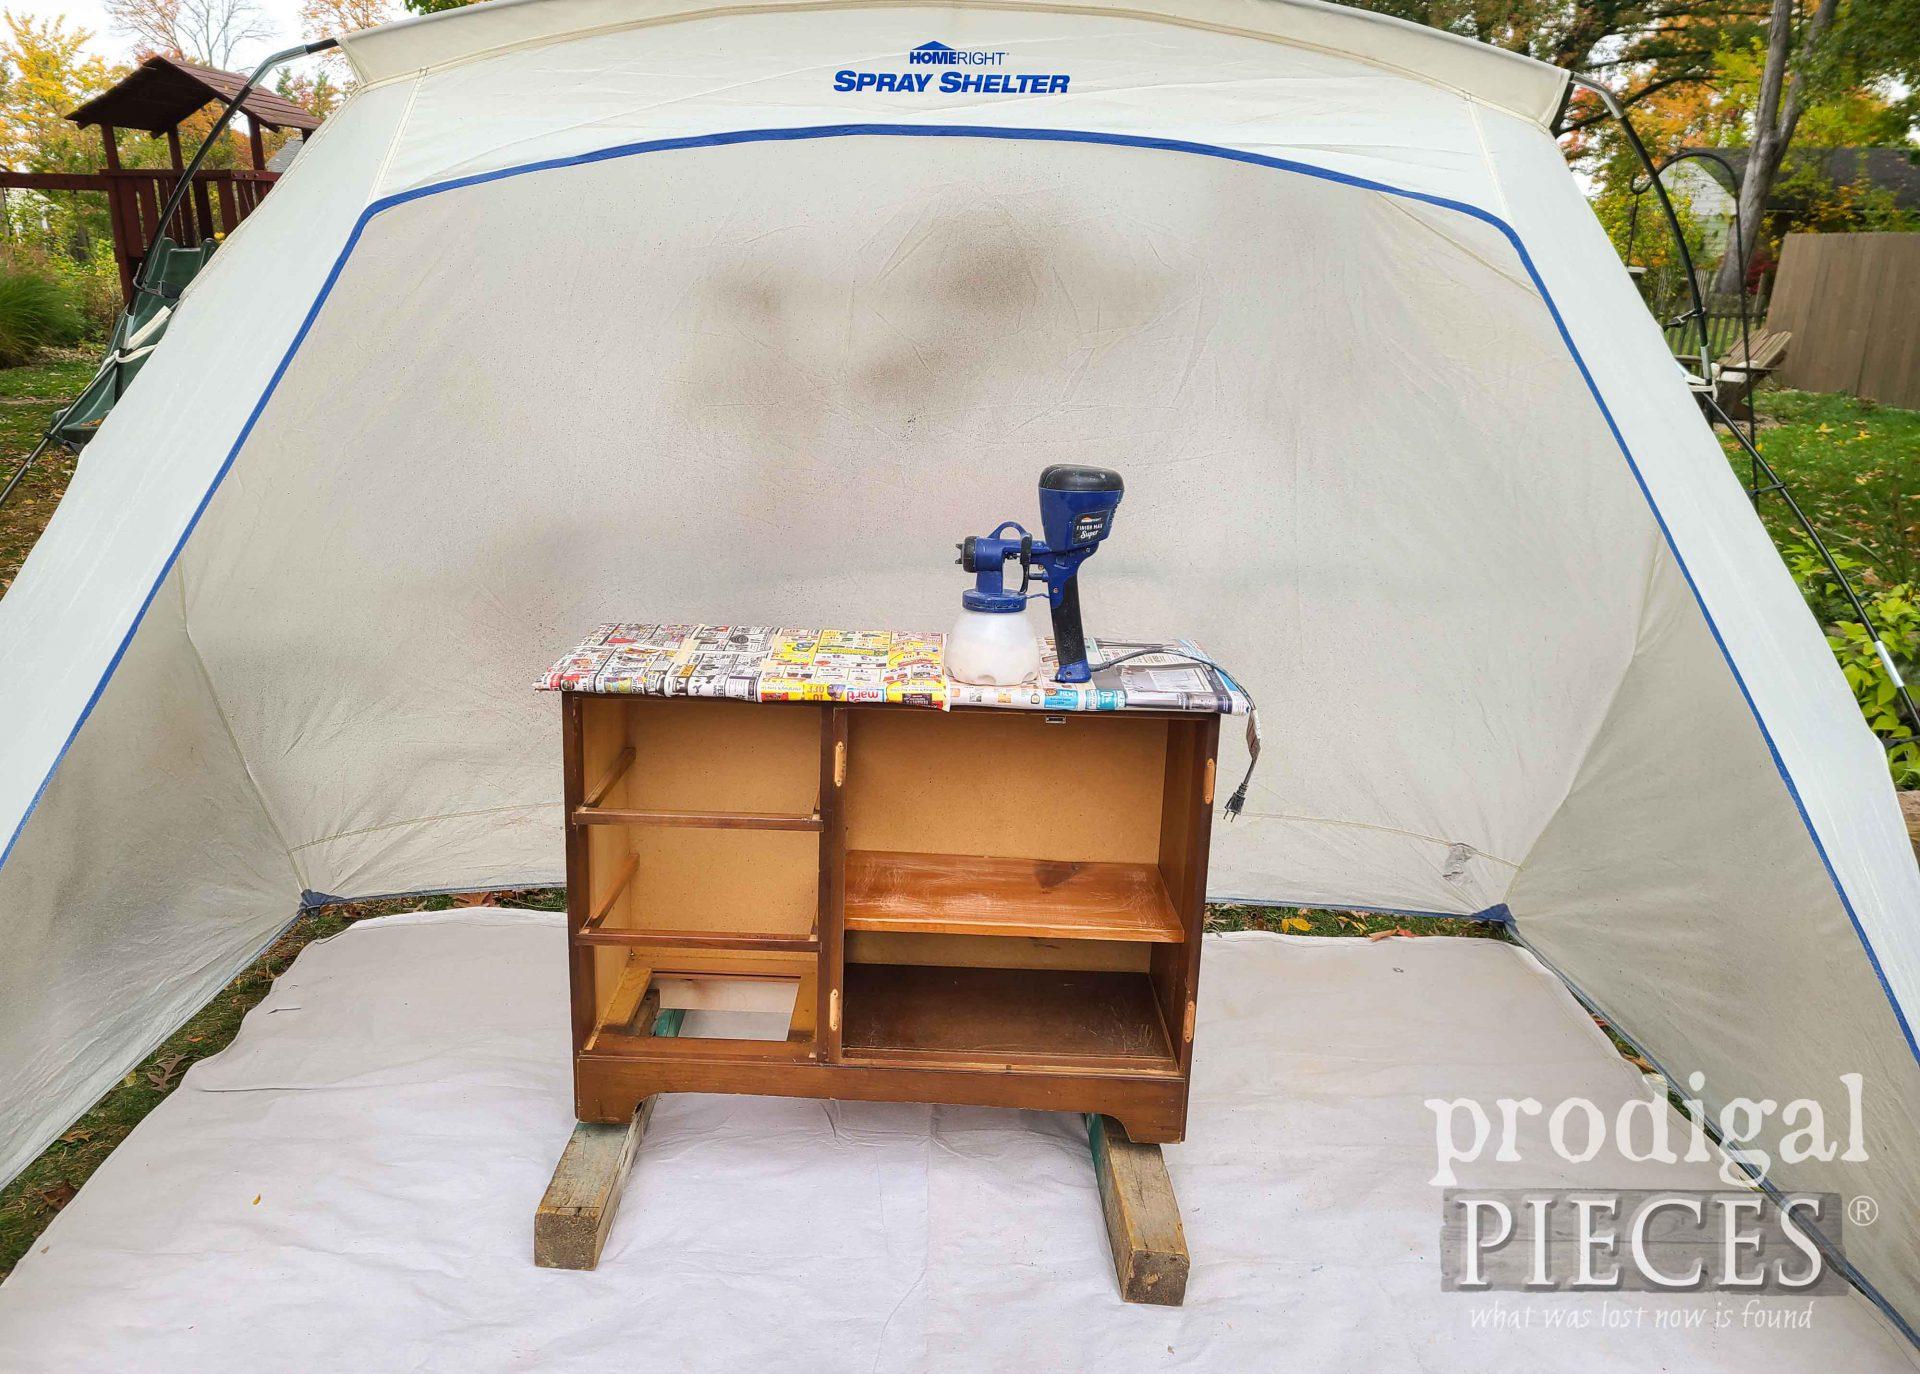 HomeRight Larger Spray Shelter with Larissa of Prodigal Pieces | prodigalpieces.com